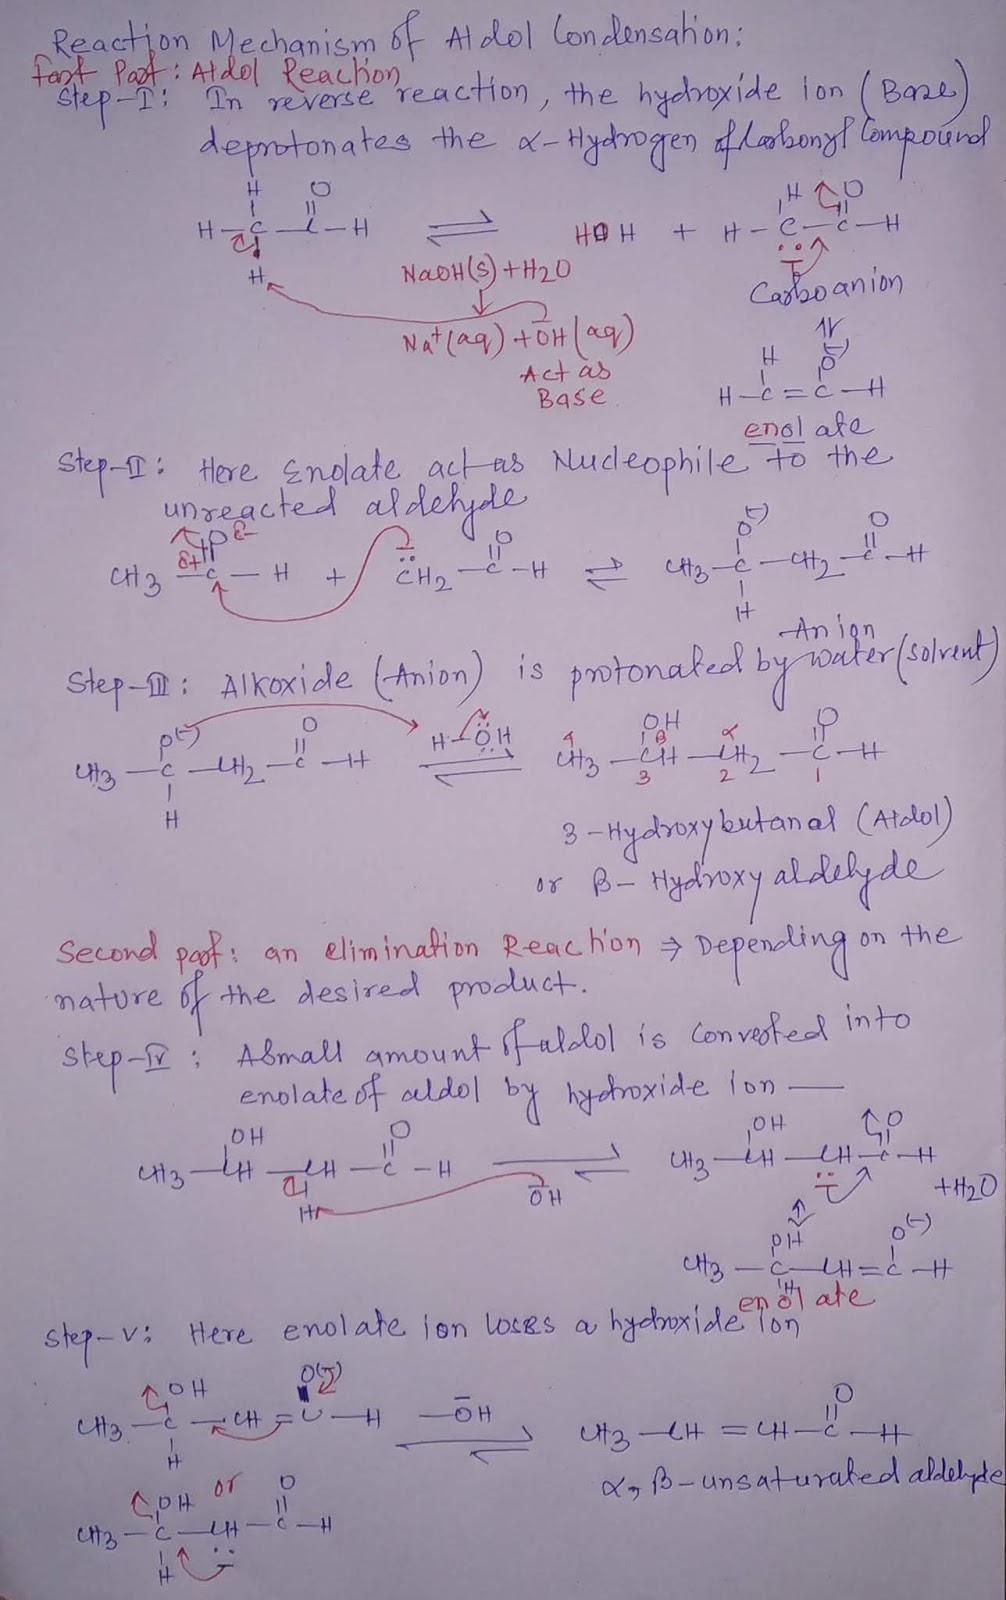 Reaction Mechanism of Aldol Condensation reaction